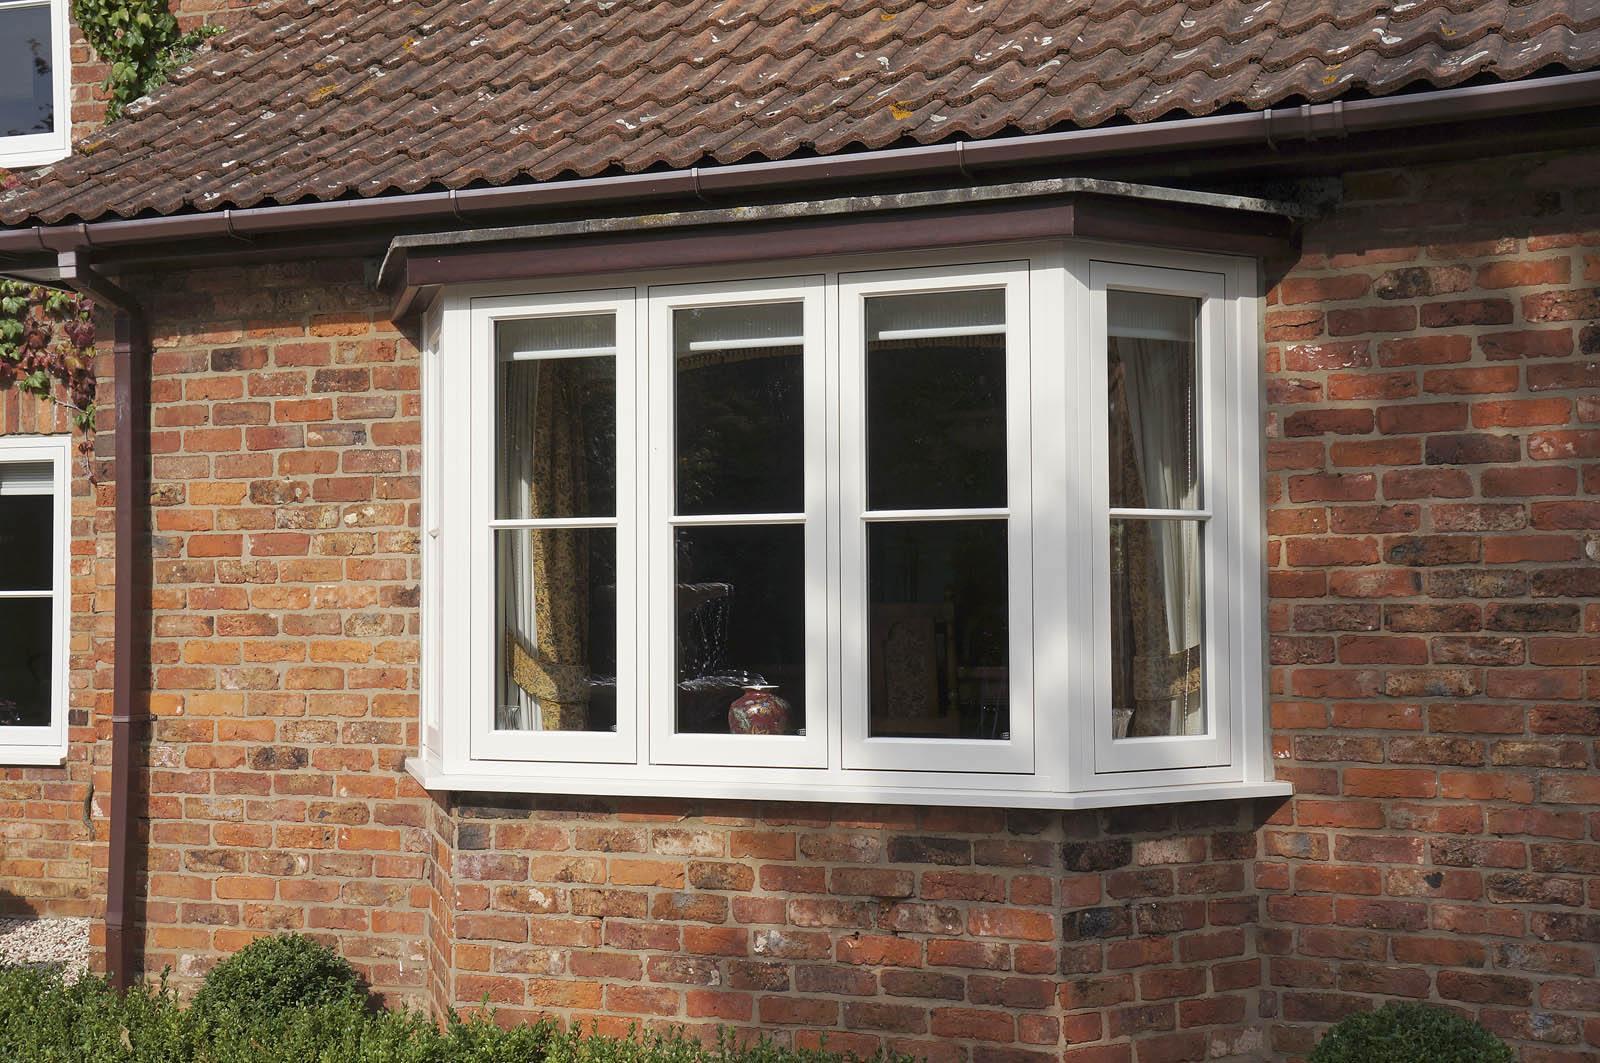 Case study yorkshire front door casement windows for French doors and windows